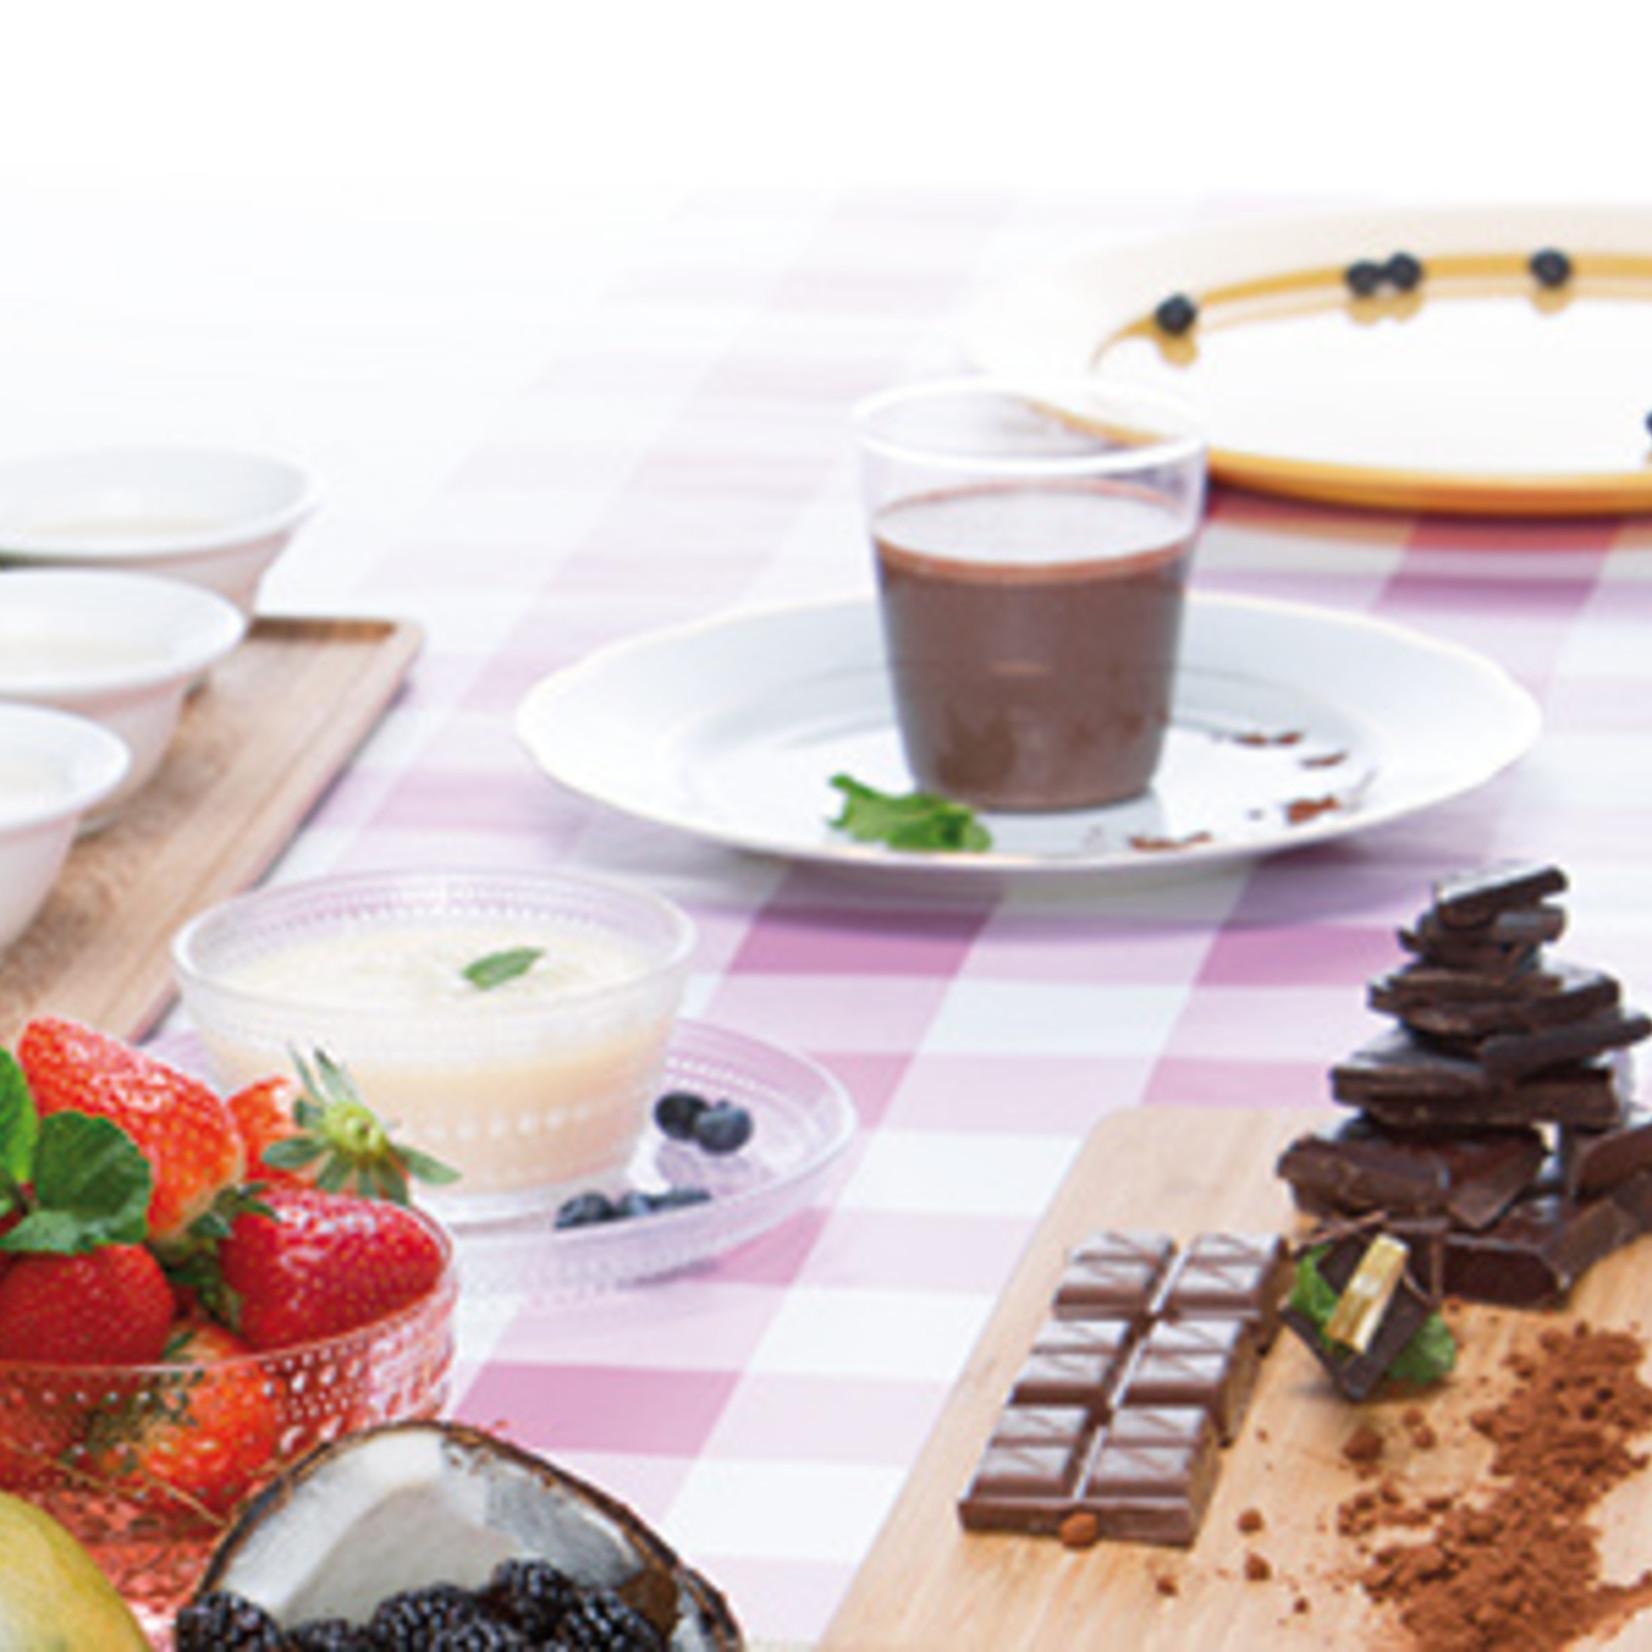 Powerslim PS02009- V1 Variatie dessert